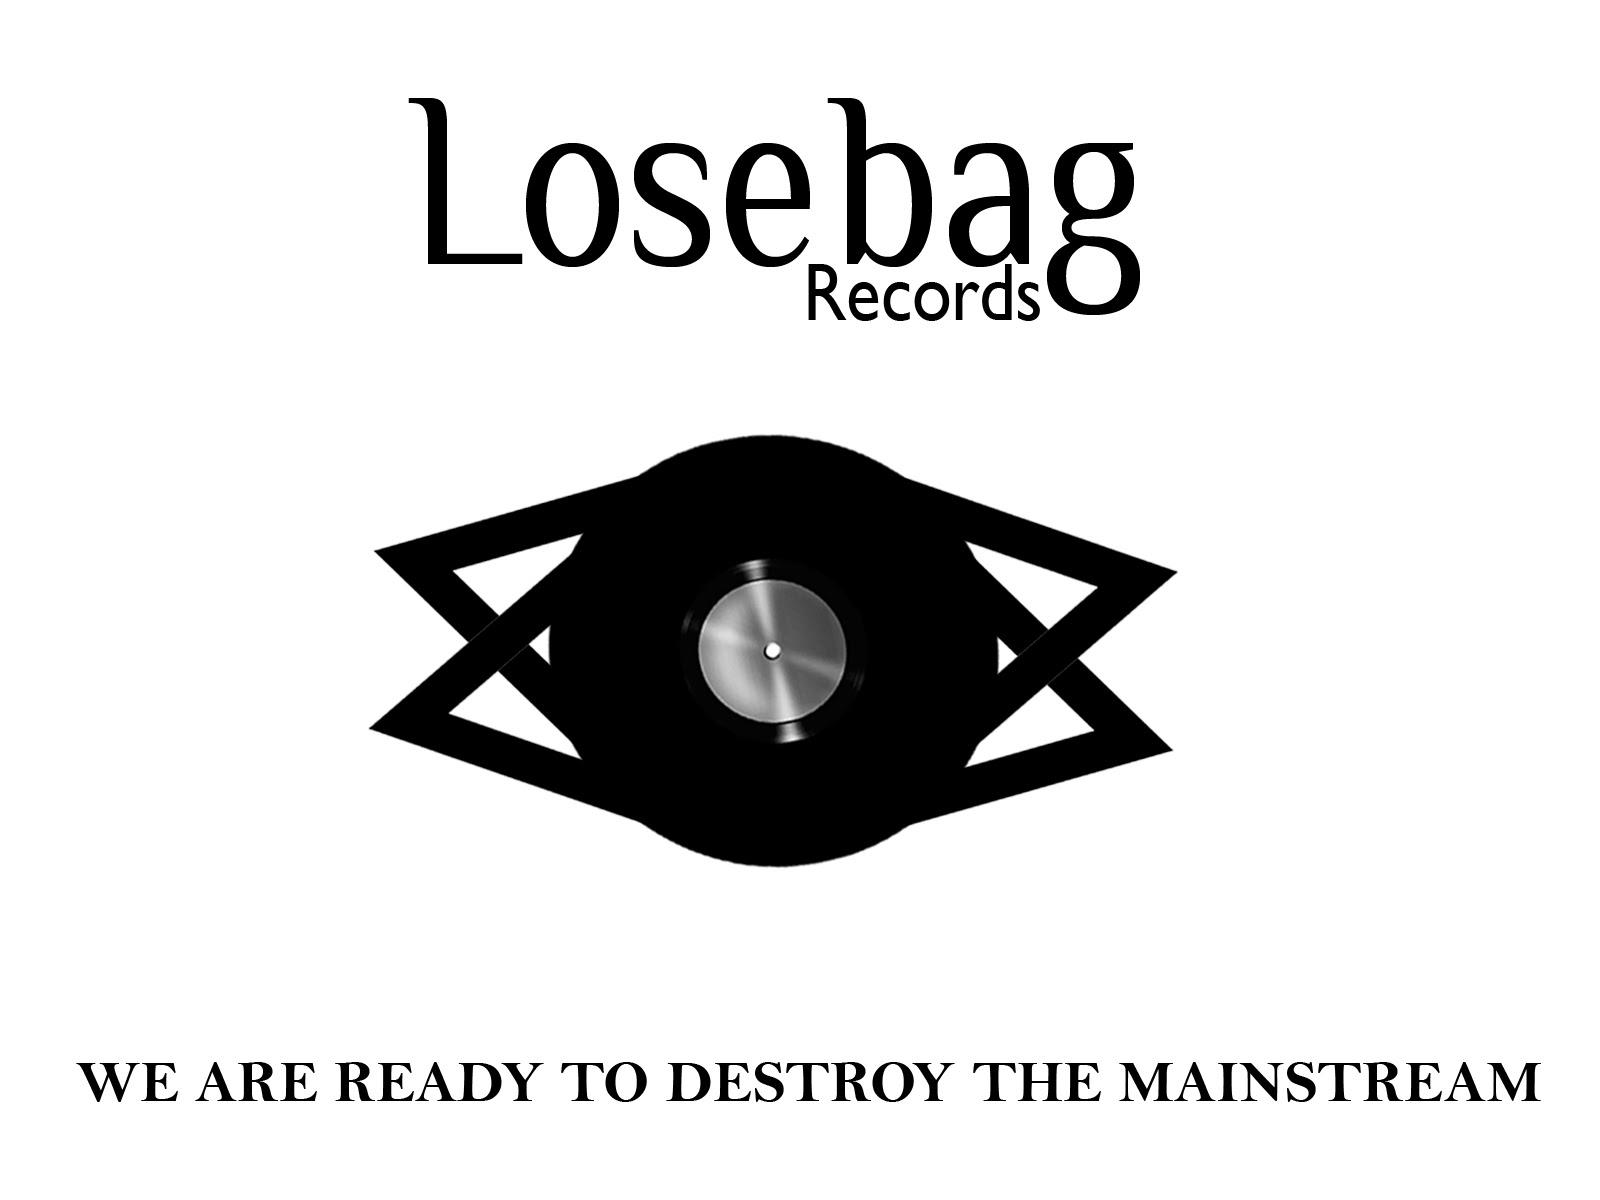 LOSEBAG RECORDS IS YOUR FUTURE